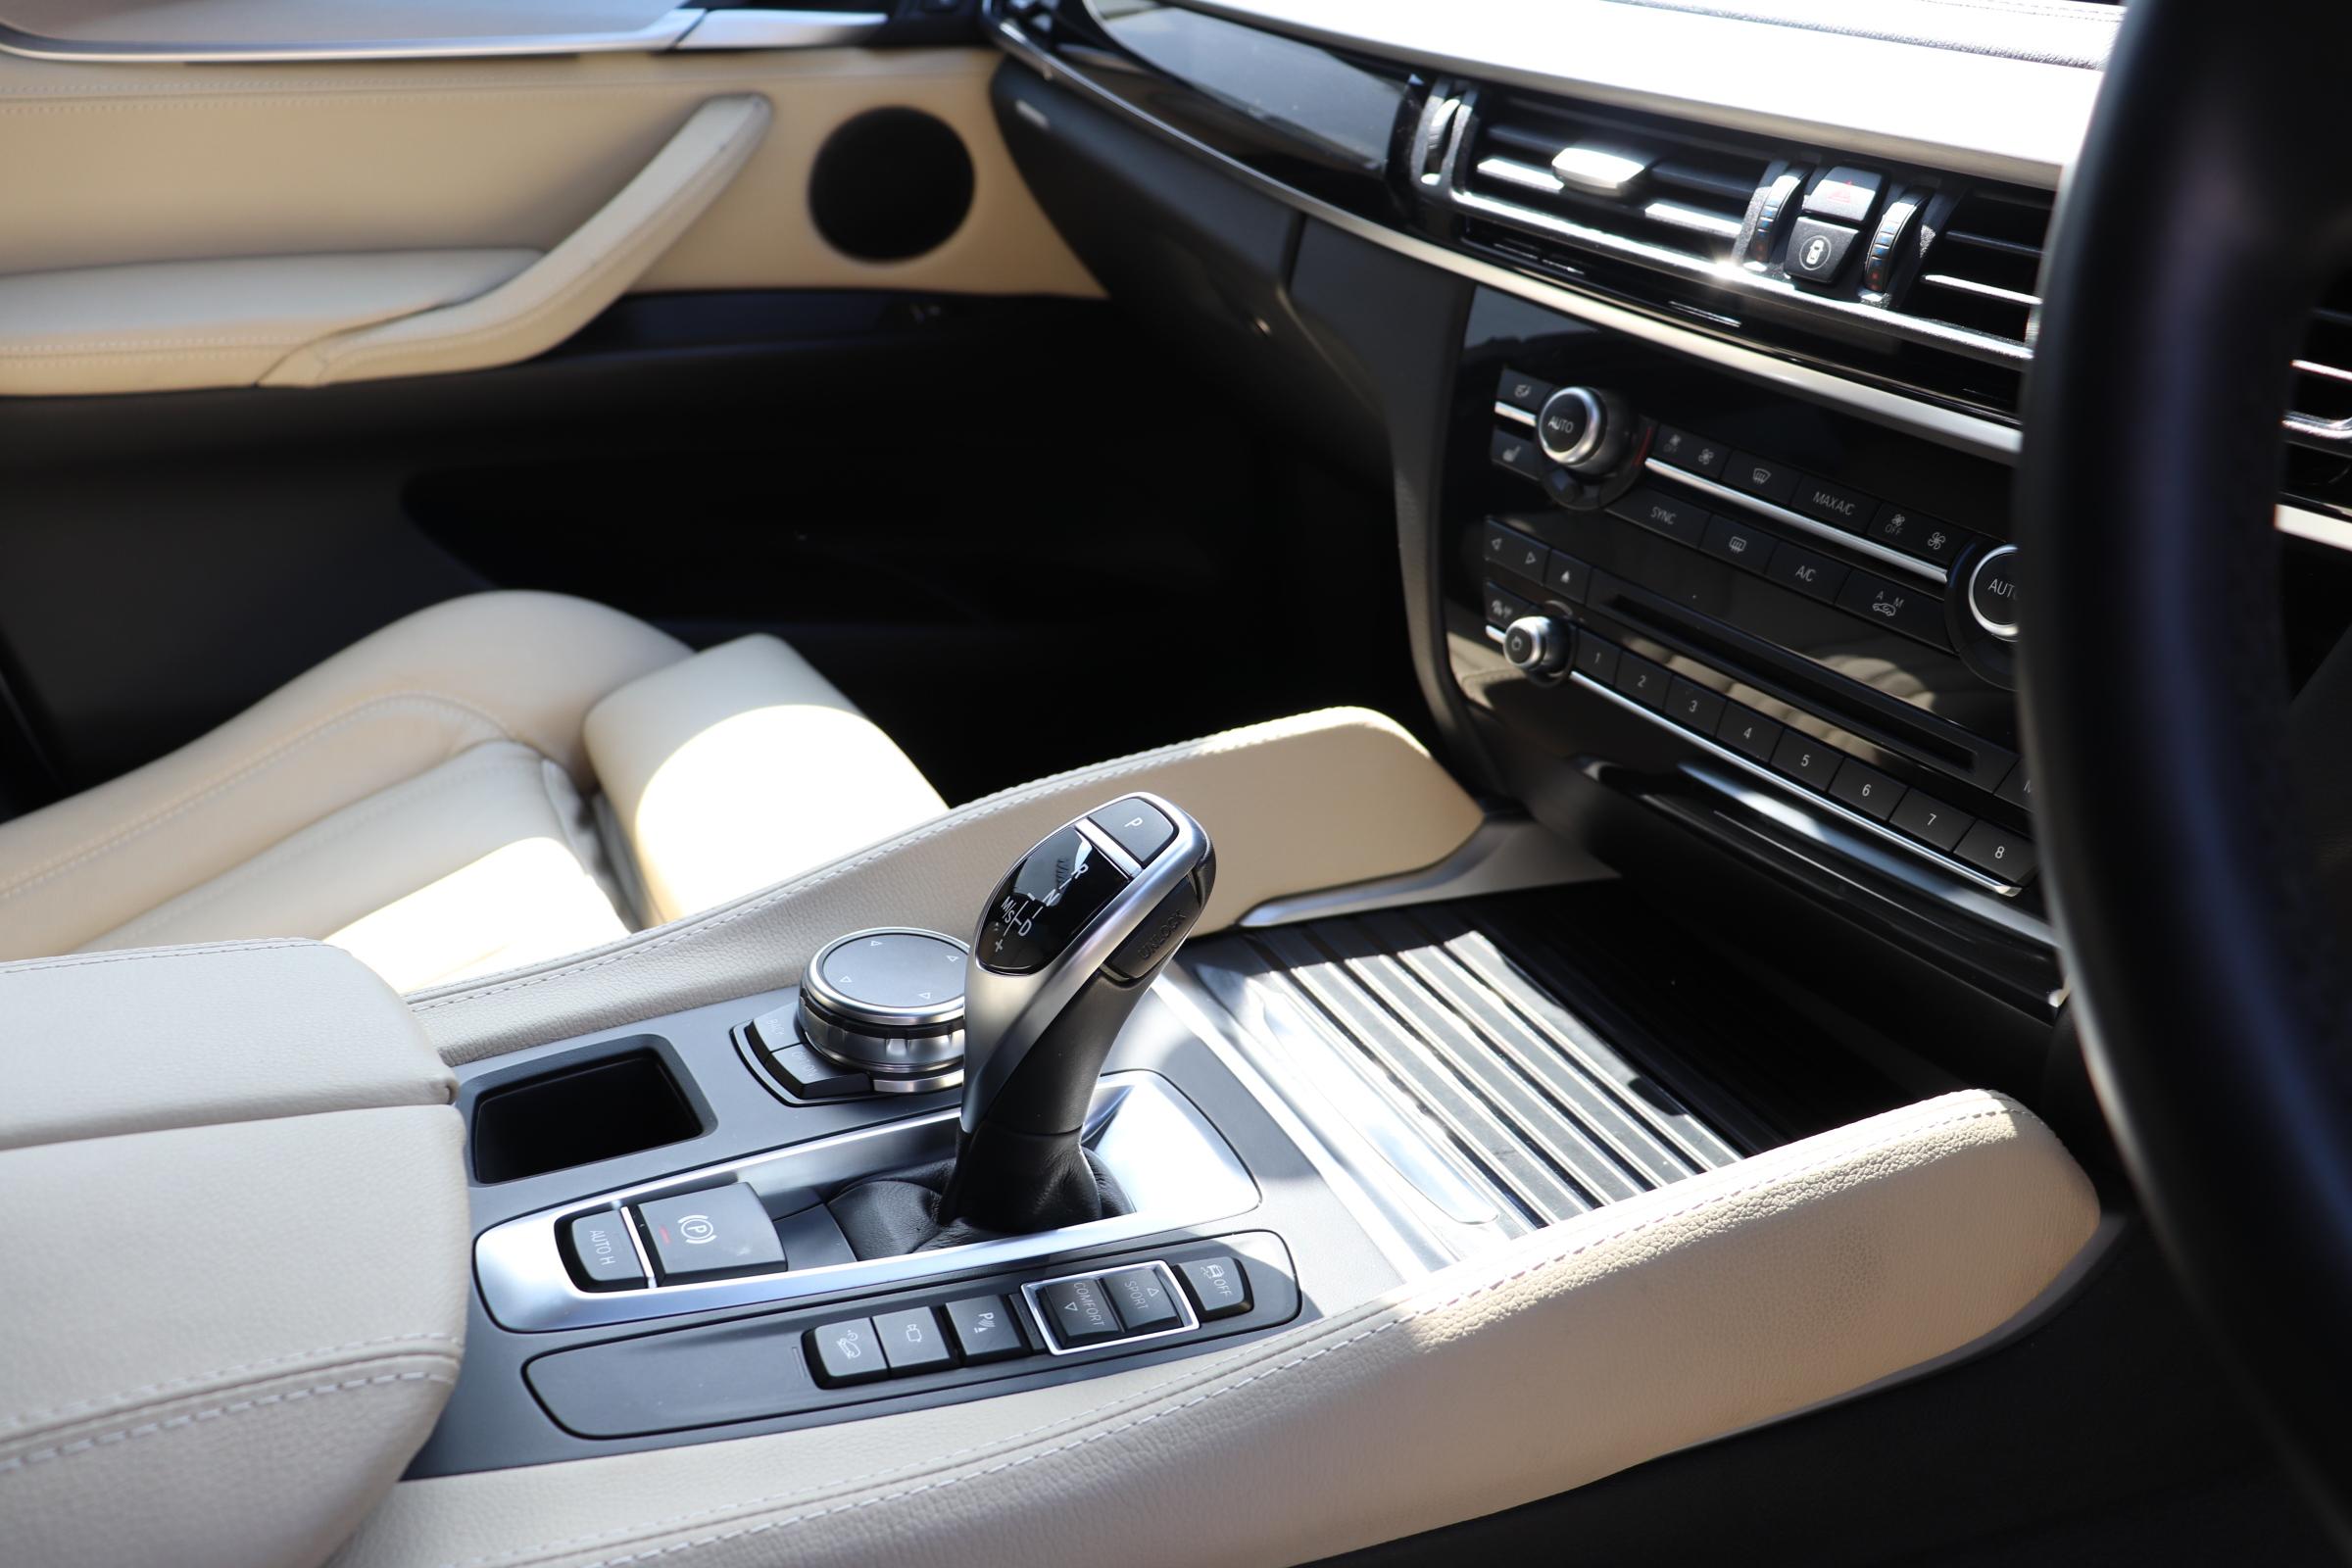 X6 xDrive35i Mスポーツ サンルーフ ヘッドアップディスプレイ パワーバックドア車両画像11